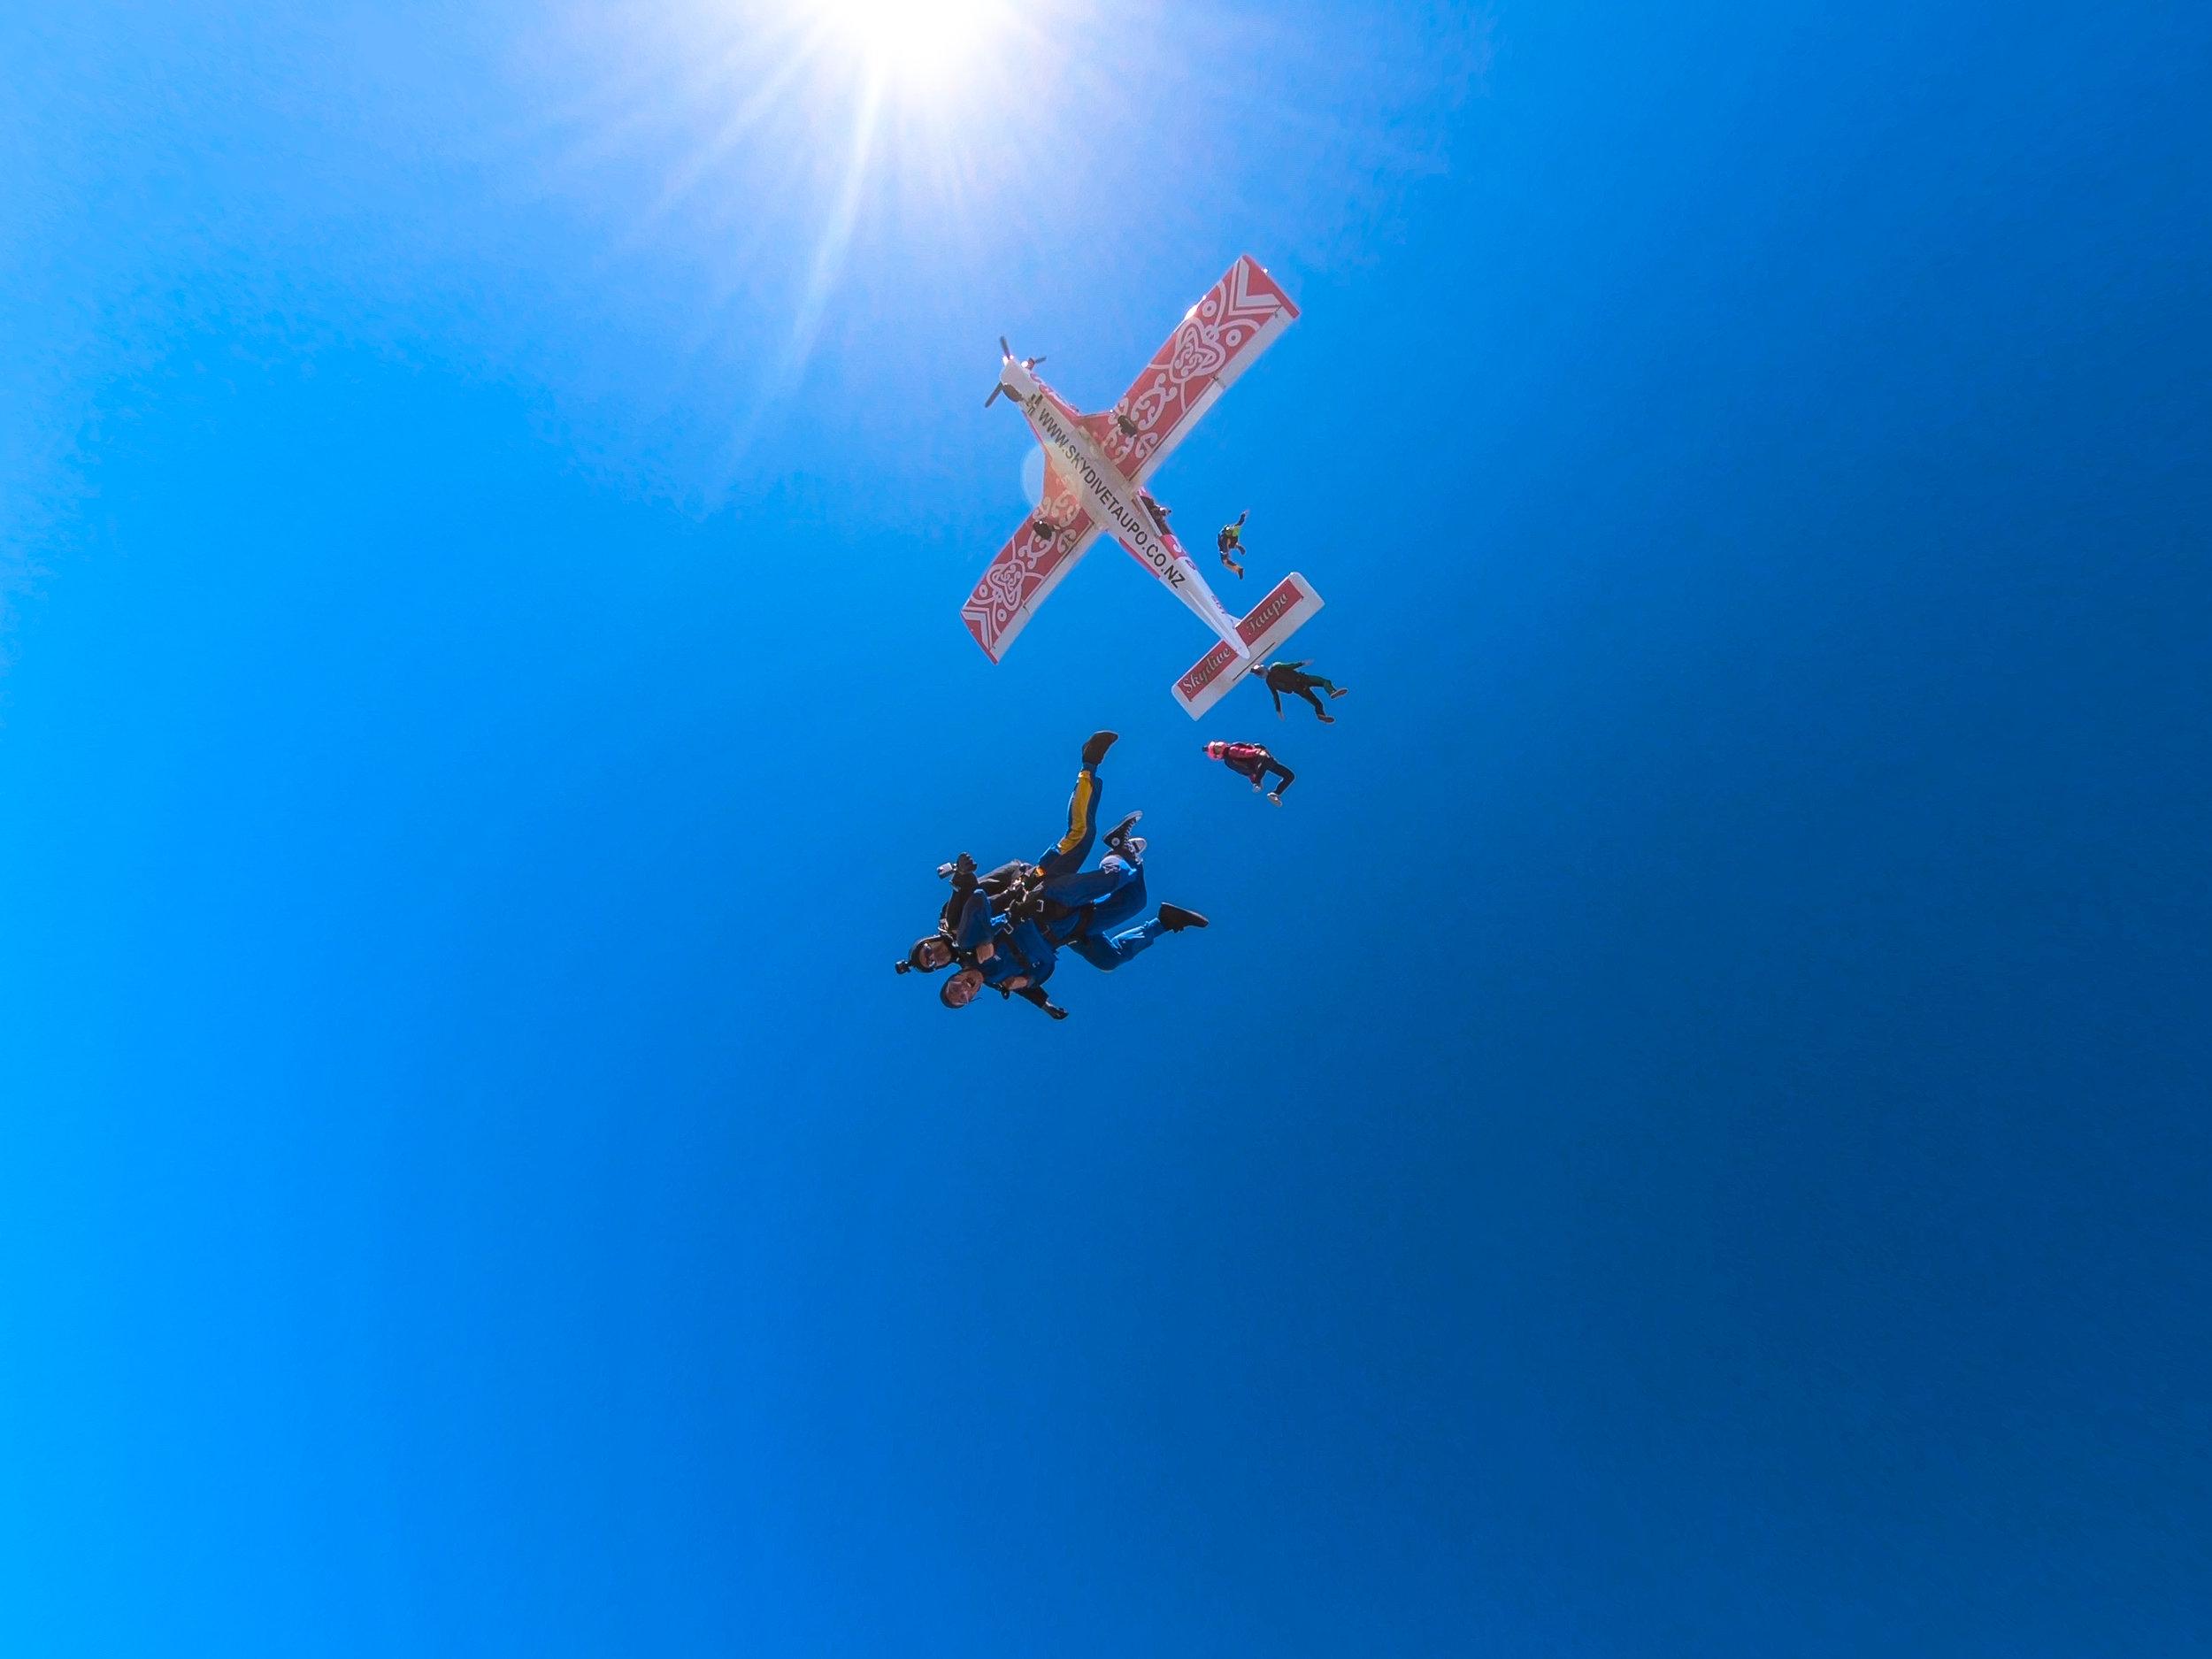 Skydive-Fall (1 of 3).JPG